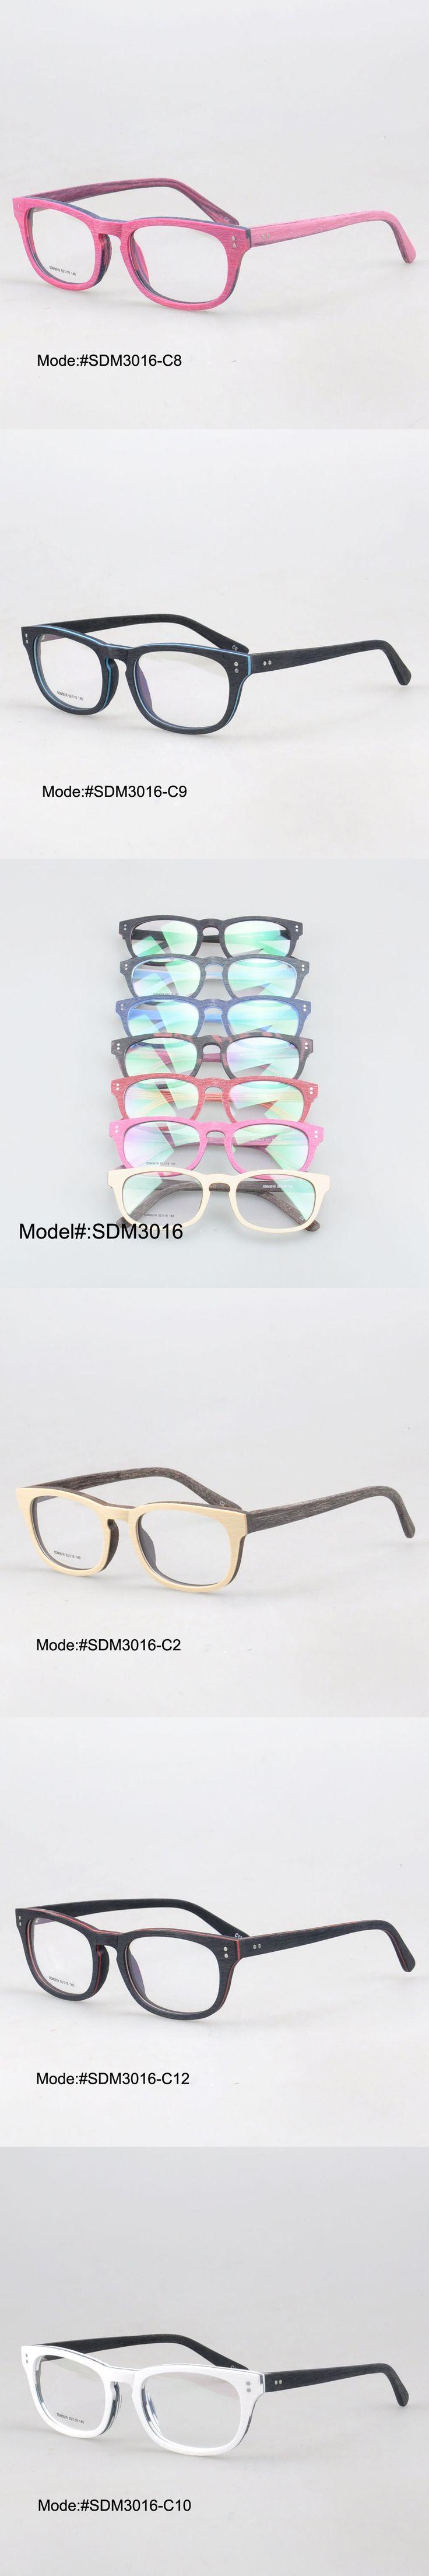 MY DOLI SDM3016 new arrival full rim fashionable acetate imitating wood glasses myopia spectacles optical frames eyewear